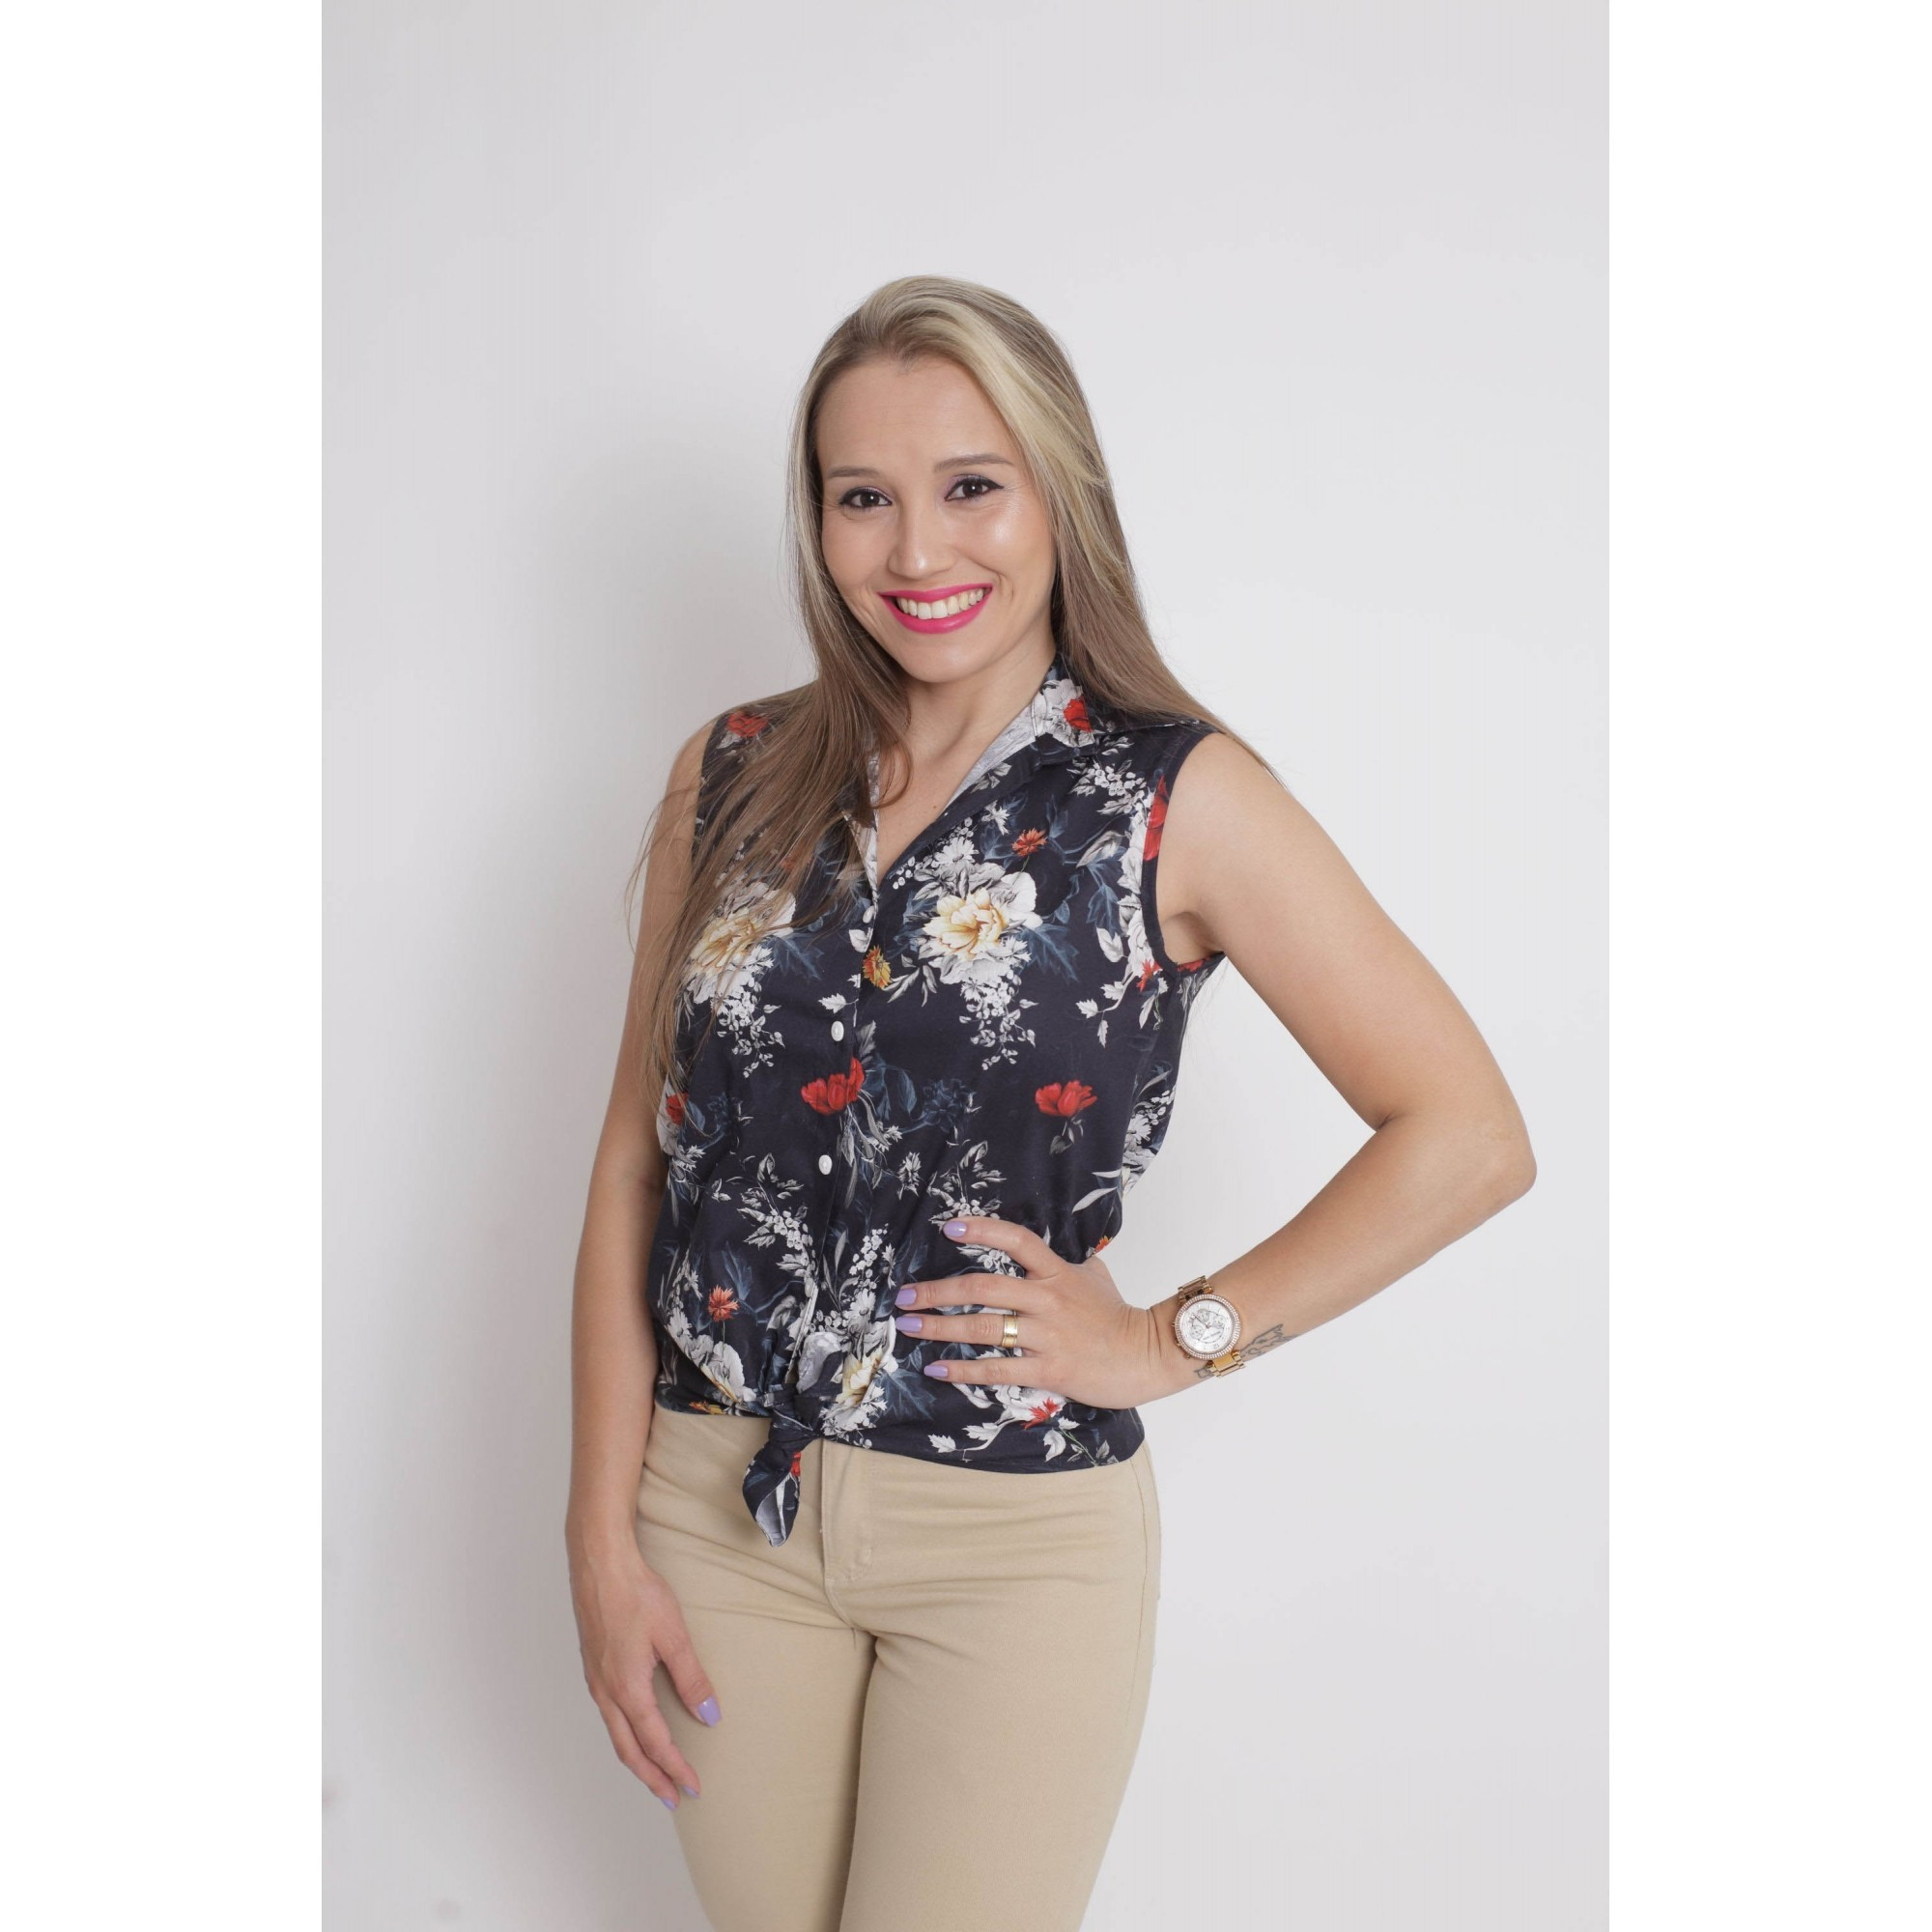 MÃE E FILHA > Kit 02 Camisas Social - Adulto e Infantil Preta Floral [Coleção Tal Mãe Tal Filha]  - Heitor Fashion Brazil